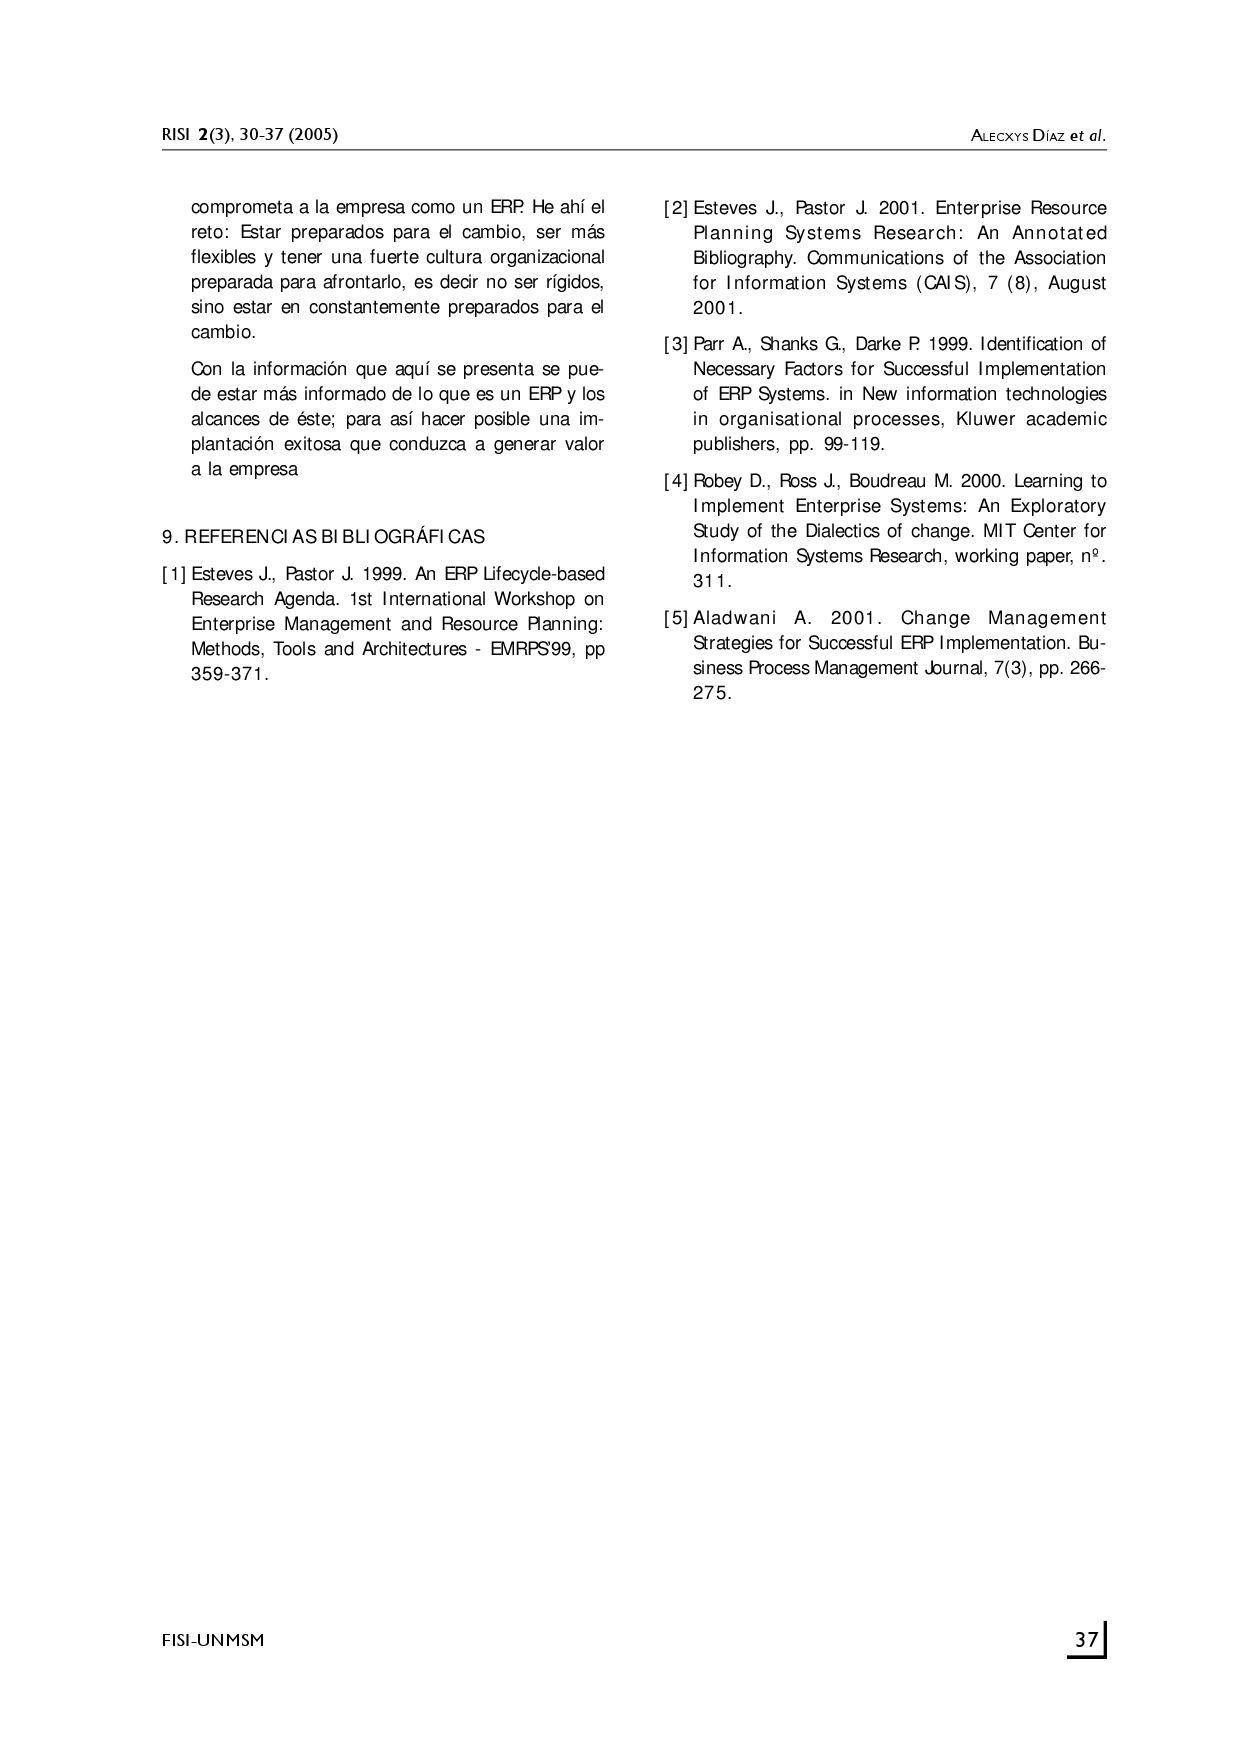 essay management of business branding